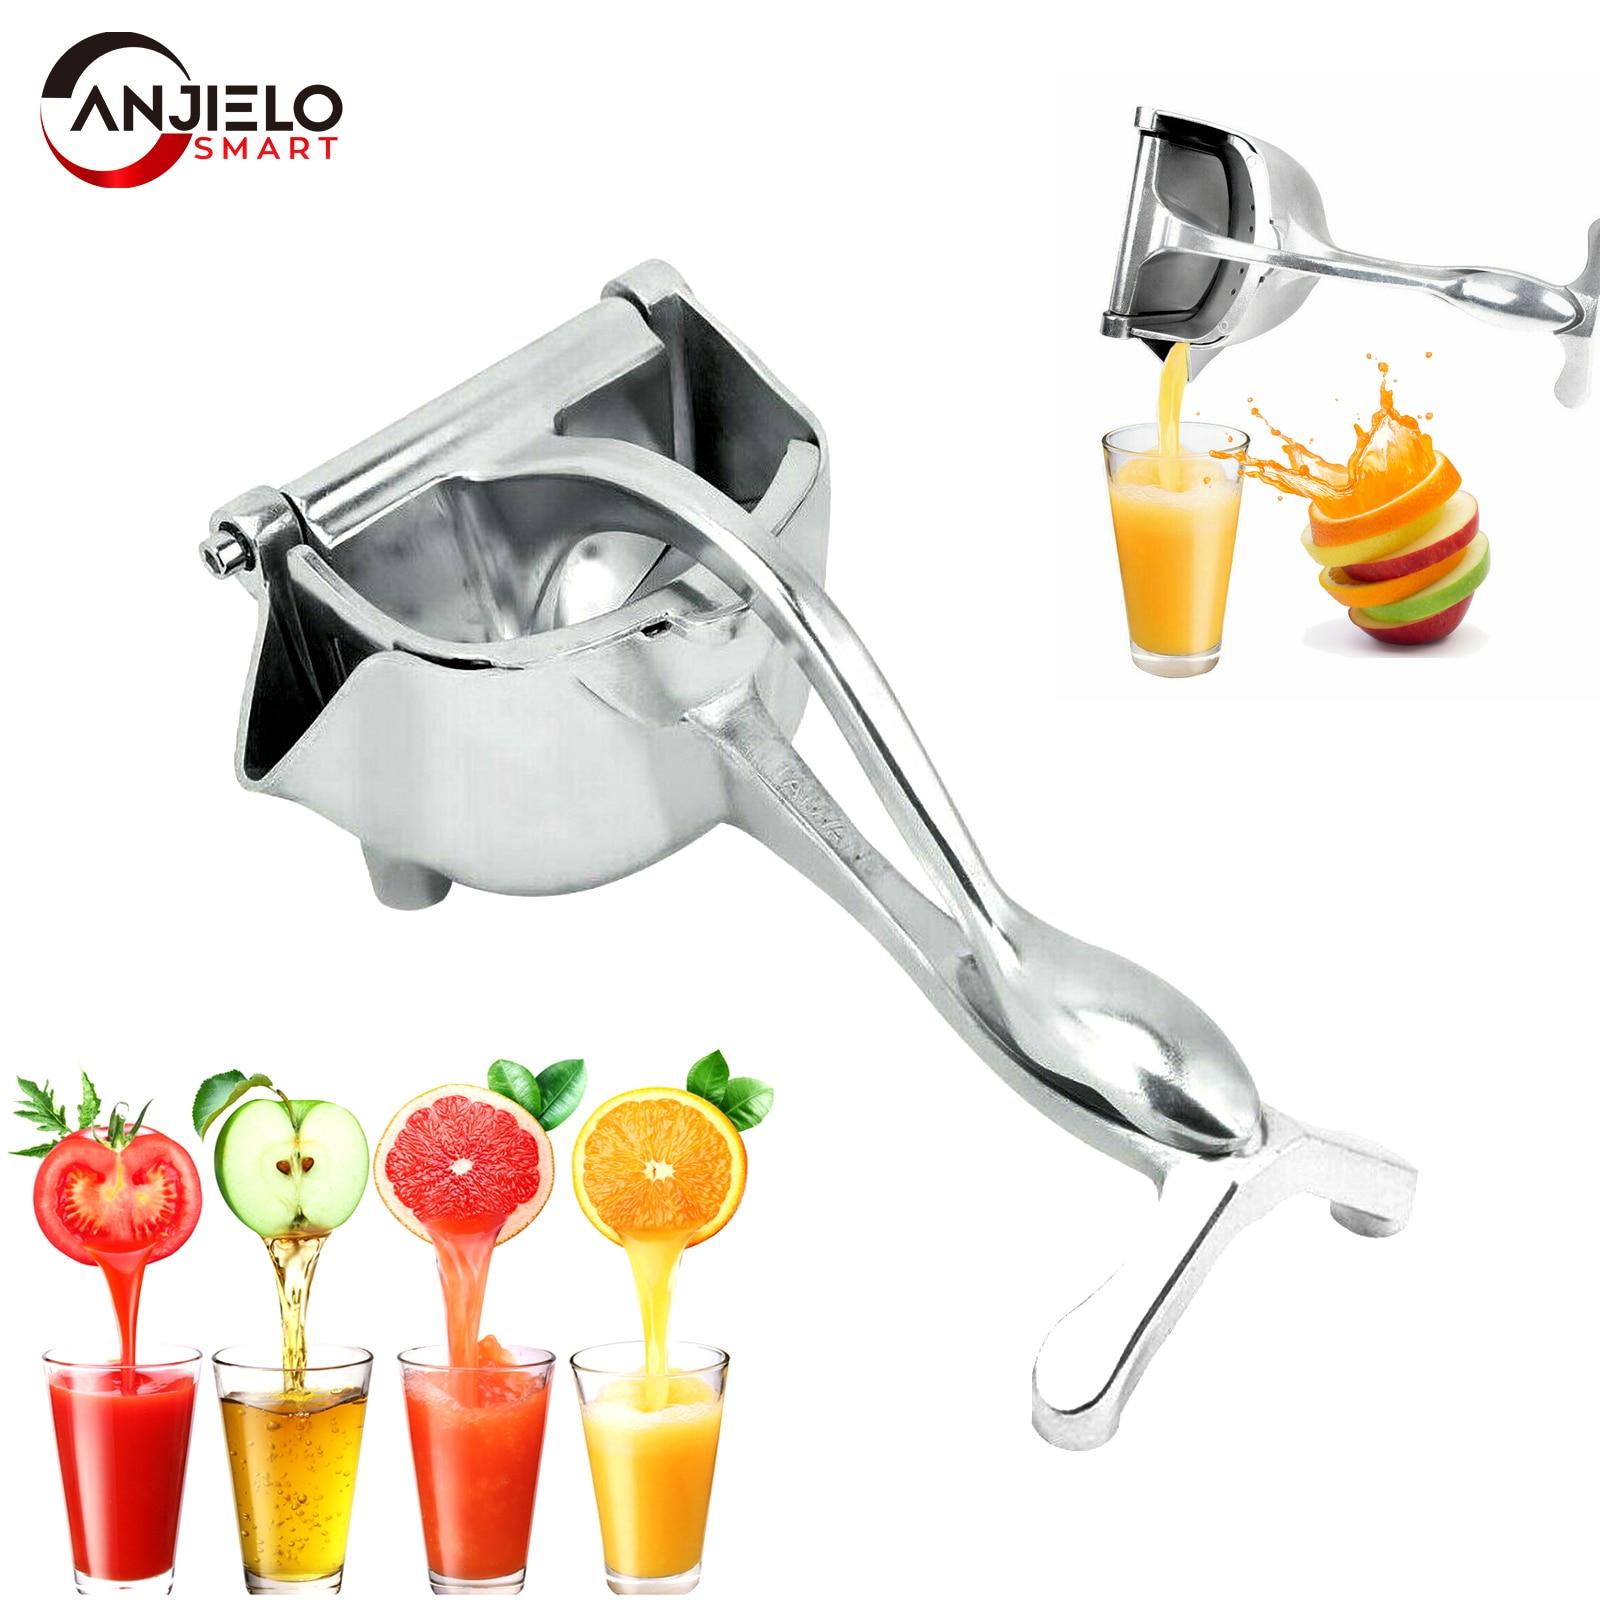 Multifunction Manual Juicer Handheld Lemon Citrus Portable Squeezer Juice Maker Machine Detachable Kitchen Kid